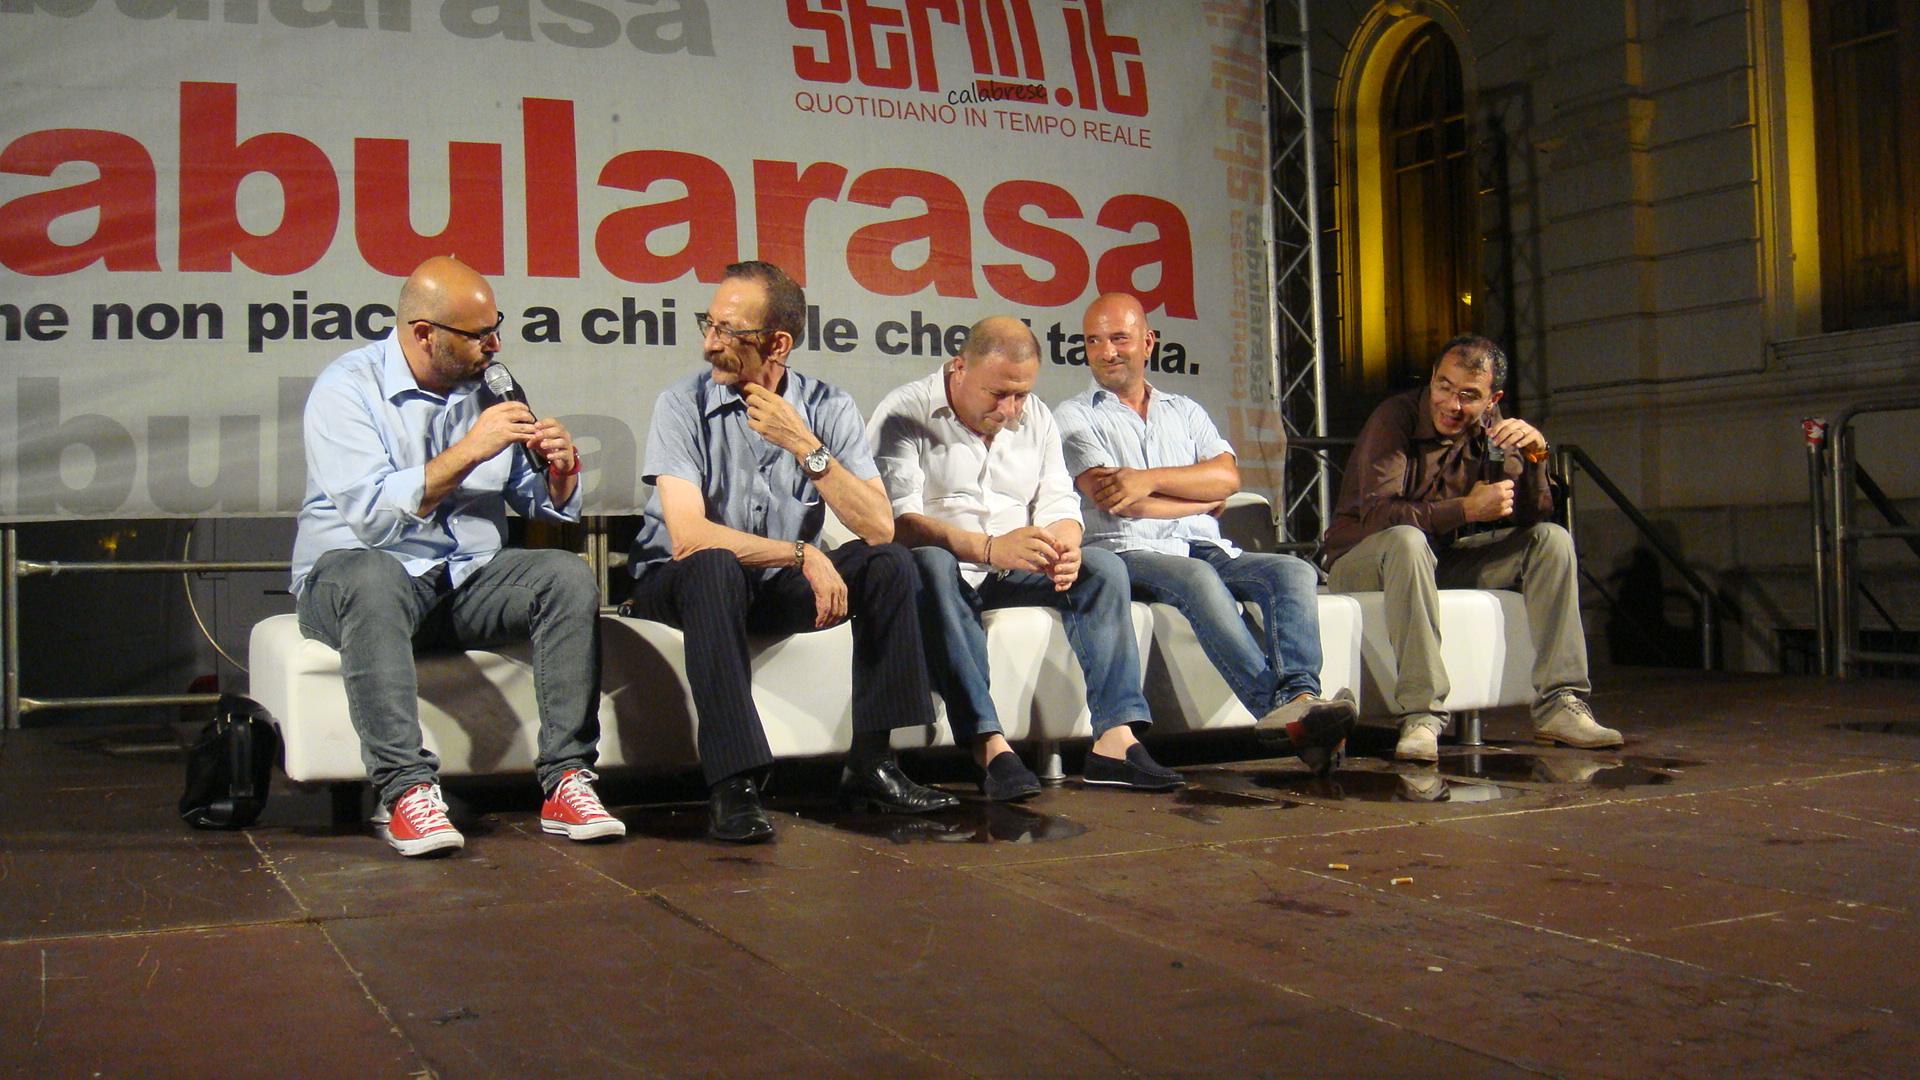 Tabularasa 2015 - Raffaele Mortelliti, Pino  Maniaci, Michele Albanese, Alessandro Russo, Giusva Branca